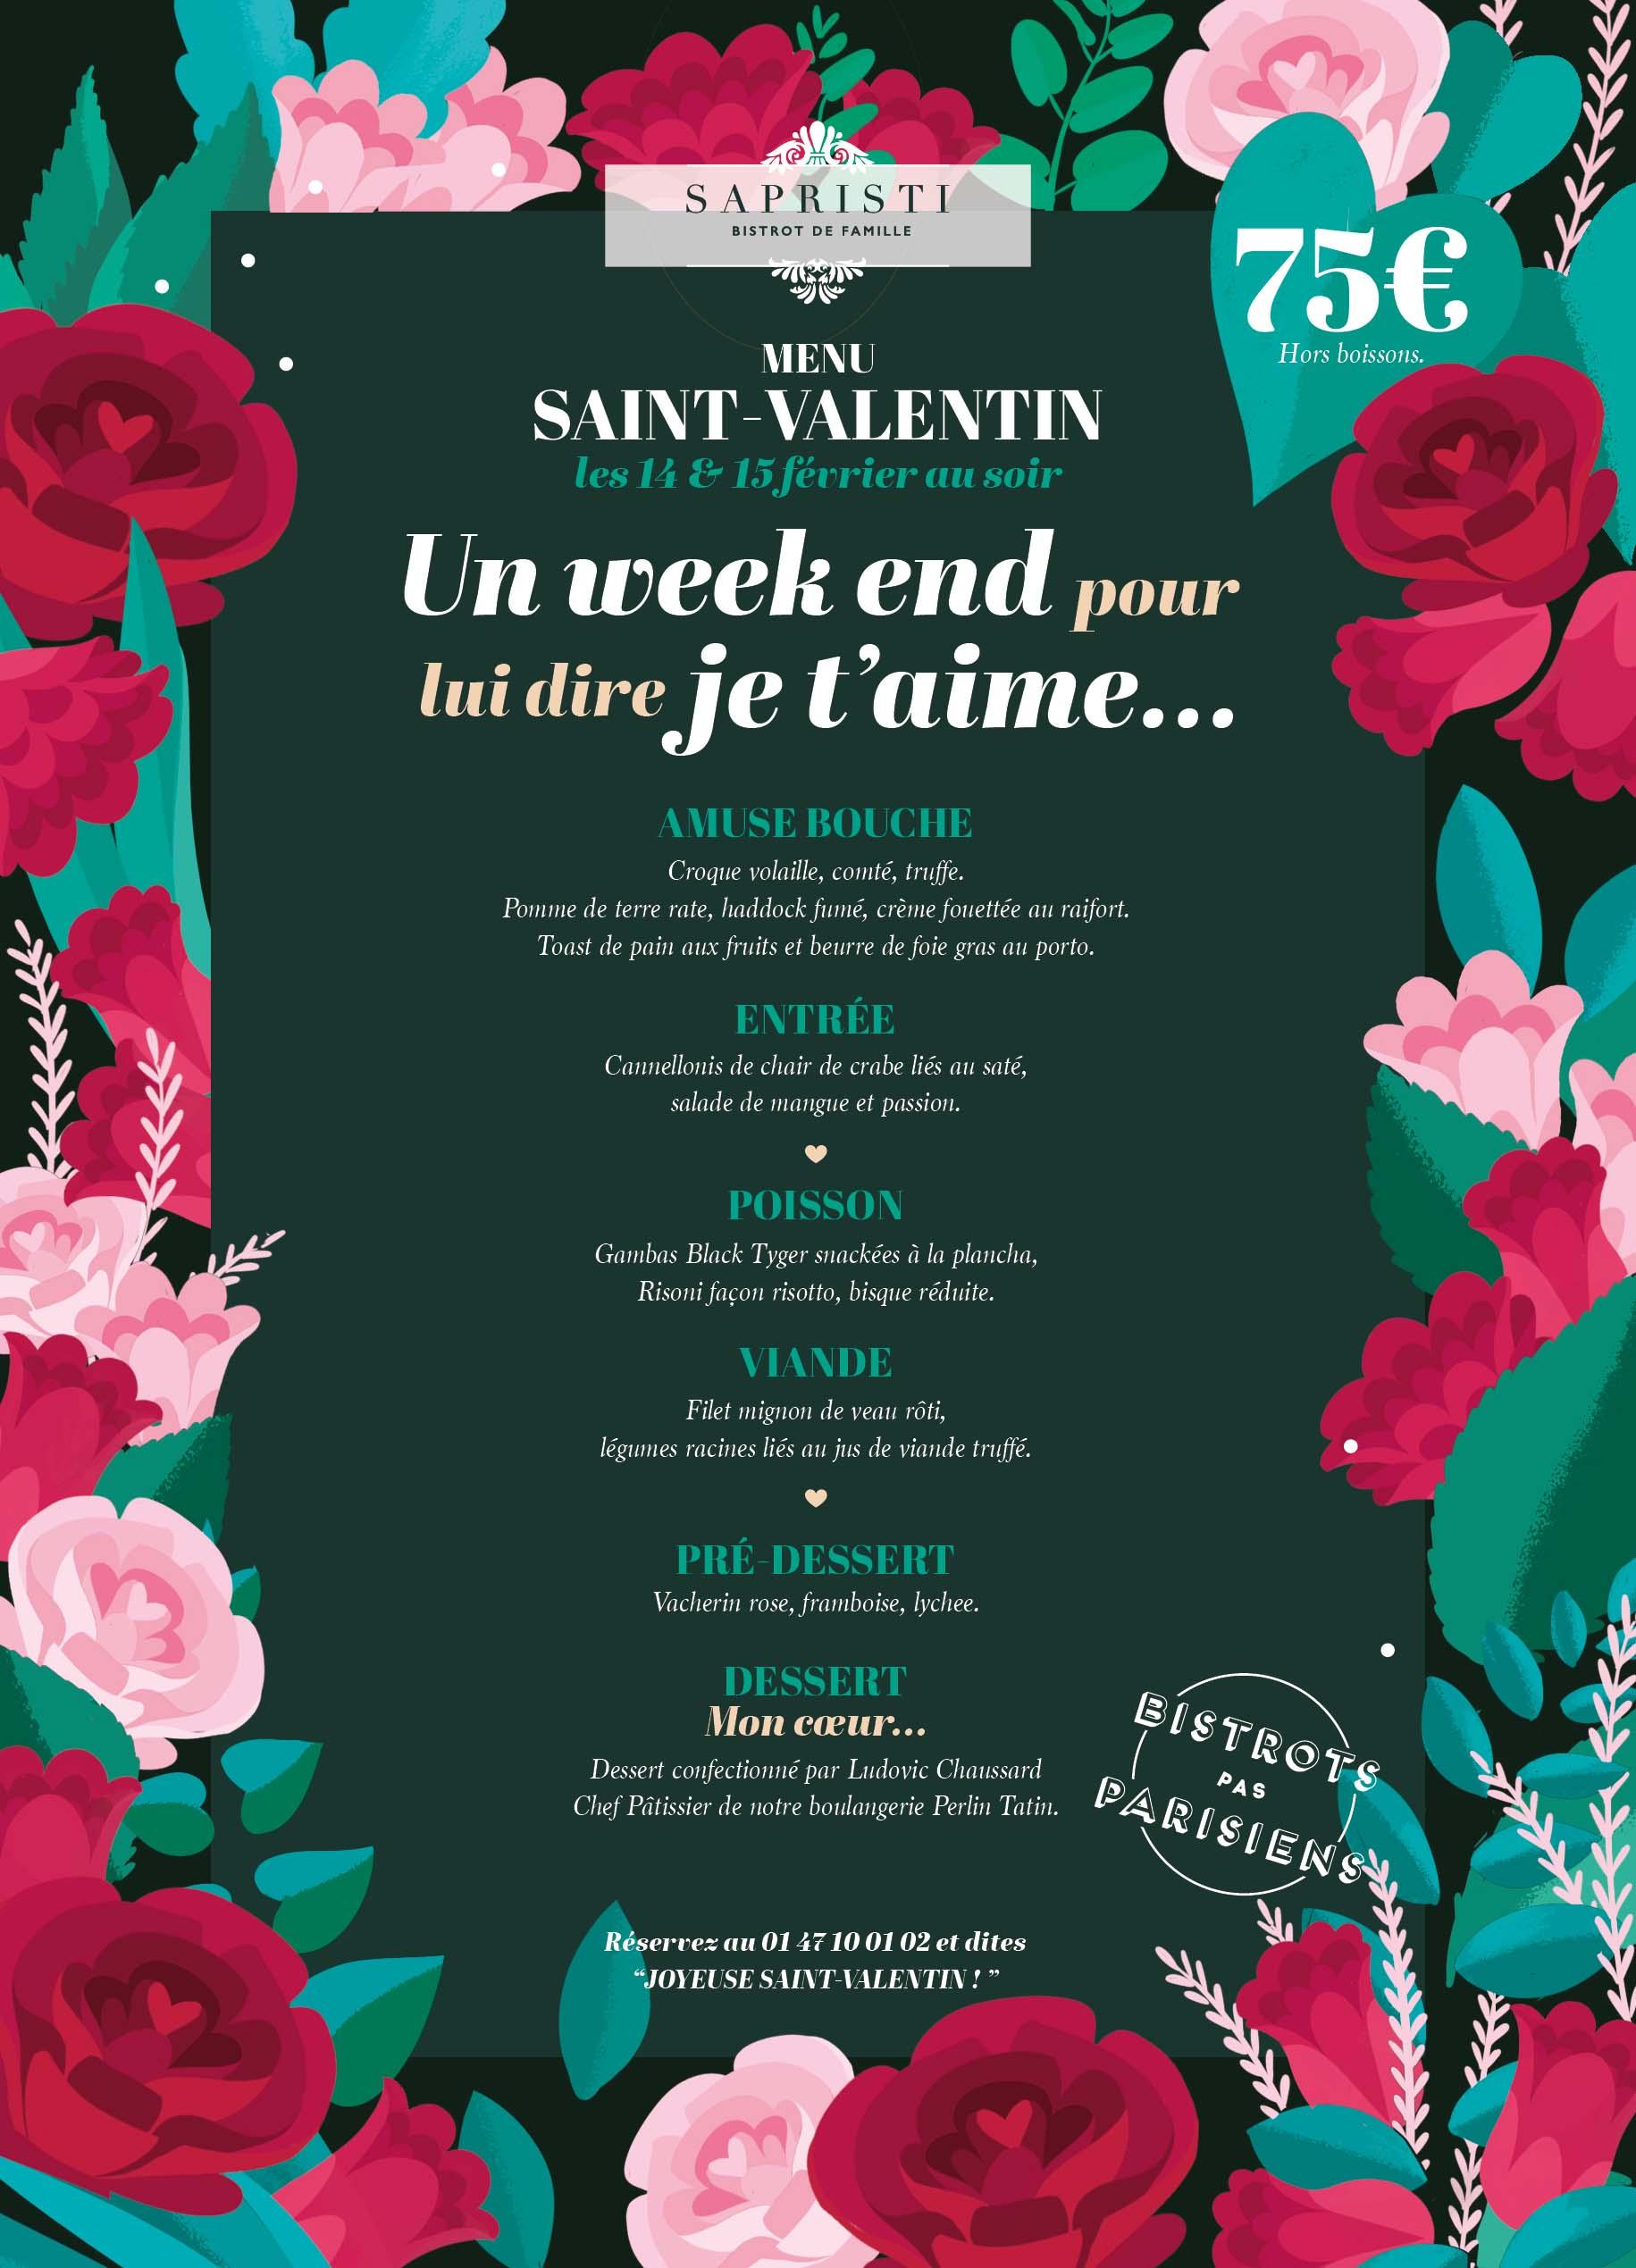 BPP-saintValentin-menu-digital-Sapristi